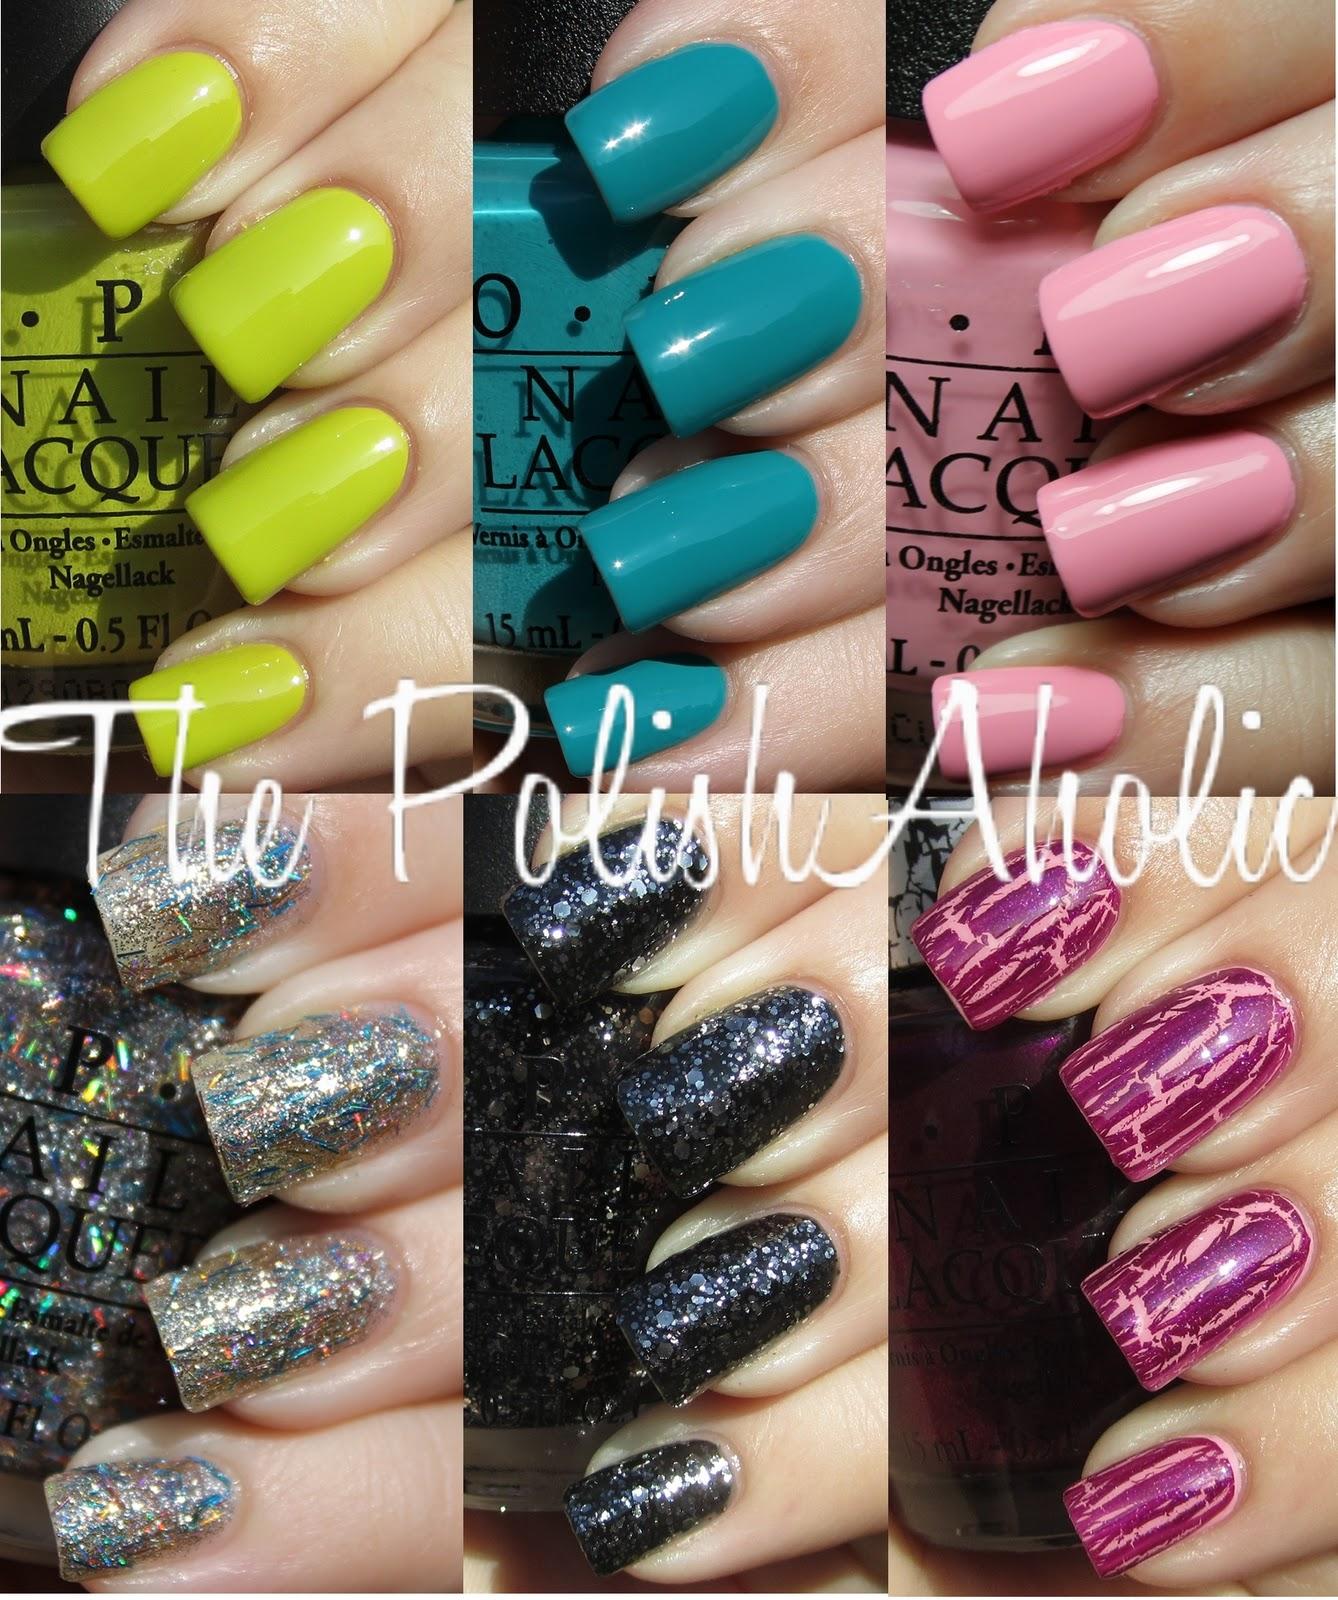 http://4.bp.blogspot.com/-QT4mpCP_n8I/TwE7zUEbRvI/AAAAAAAAEtk/O1lIcb5PMfA/s1600/OPI+Nicki+Minaj+Collection.jpg